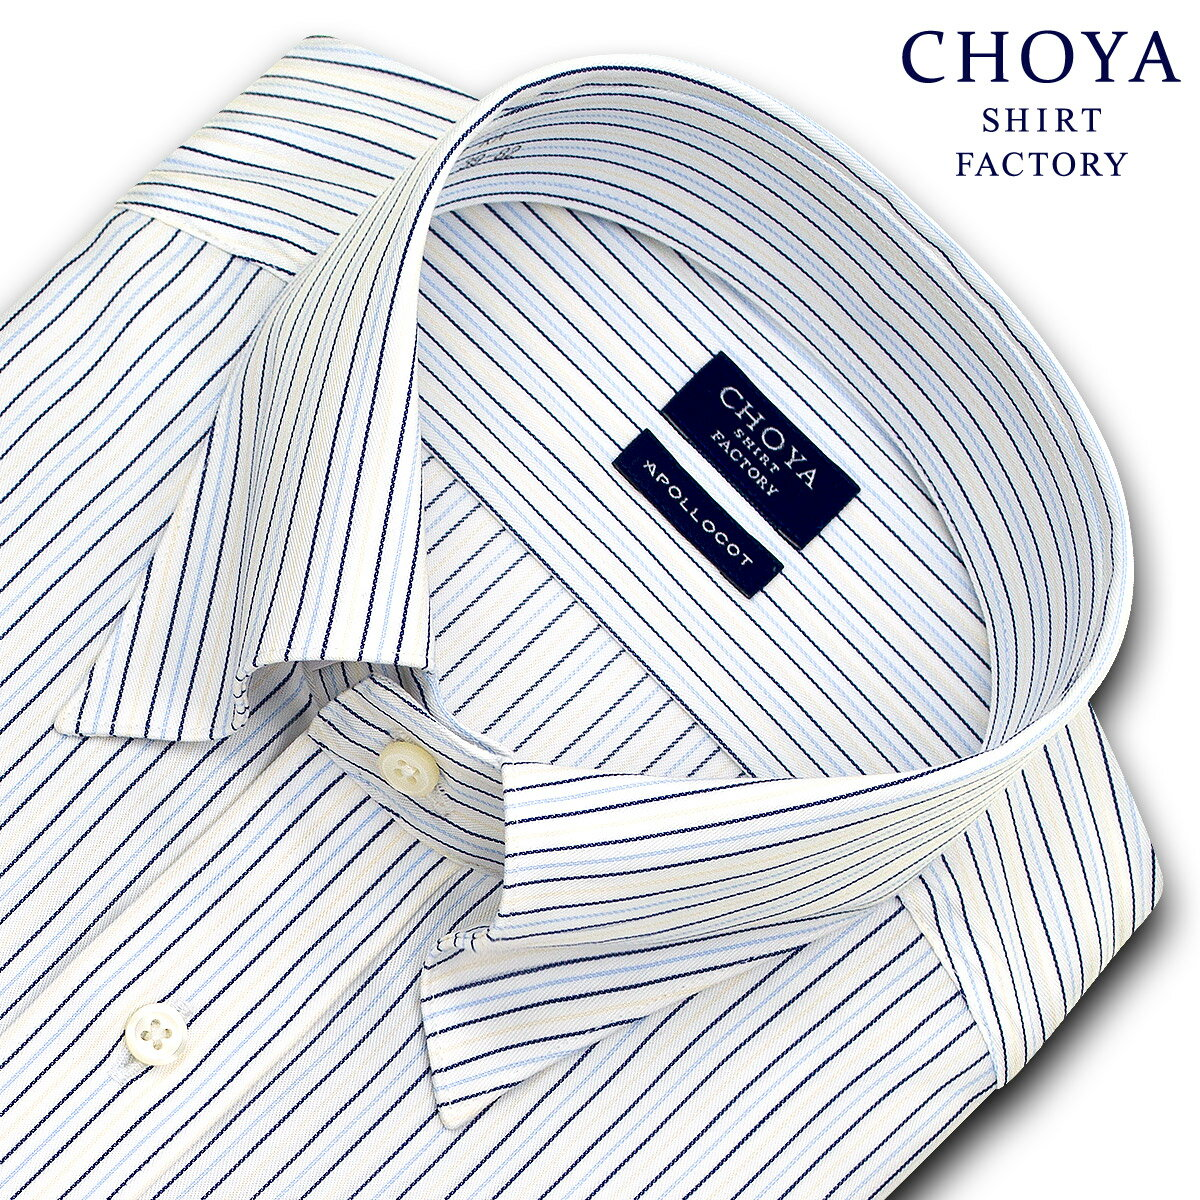 CHOYA SHIRT FACTORY 日清紡アポロコット 長袖 ワイシャツ メンズ 春夏秋冬 形態安定加工 マルチカラーペンシルストライプ スナップダウンシャツ|綿:100% ネイビー(cfd337-450)